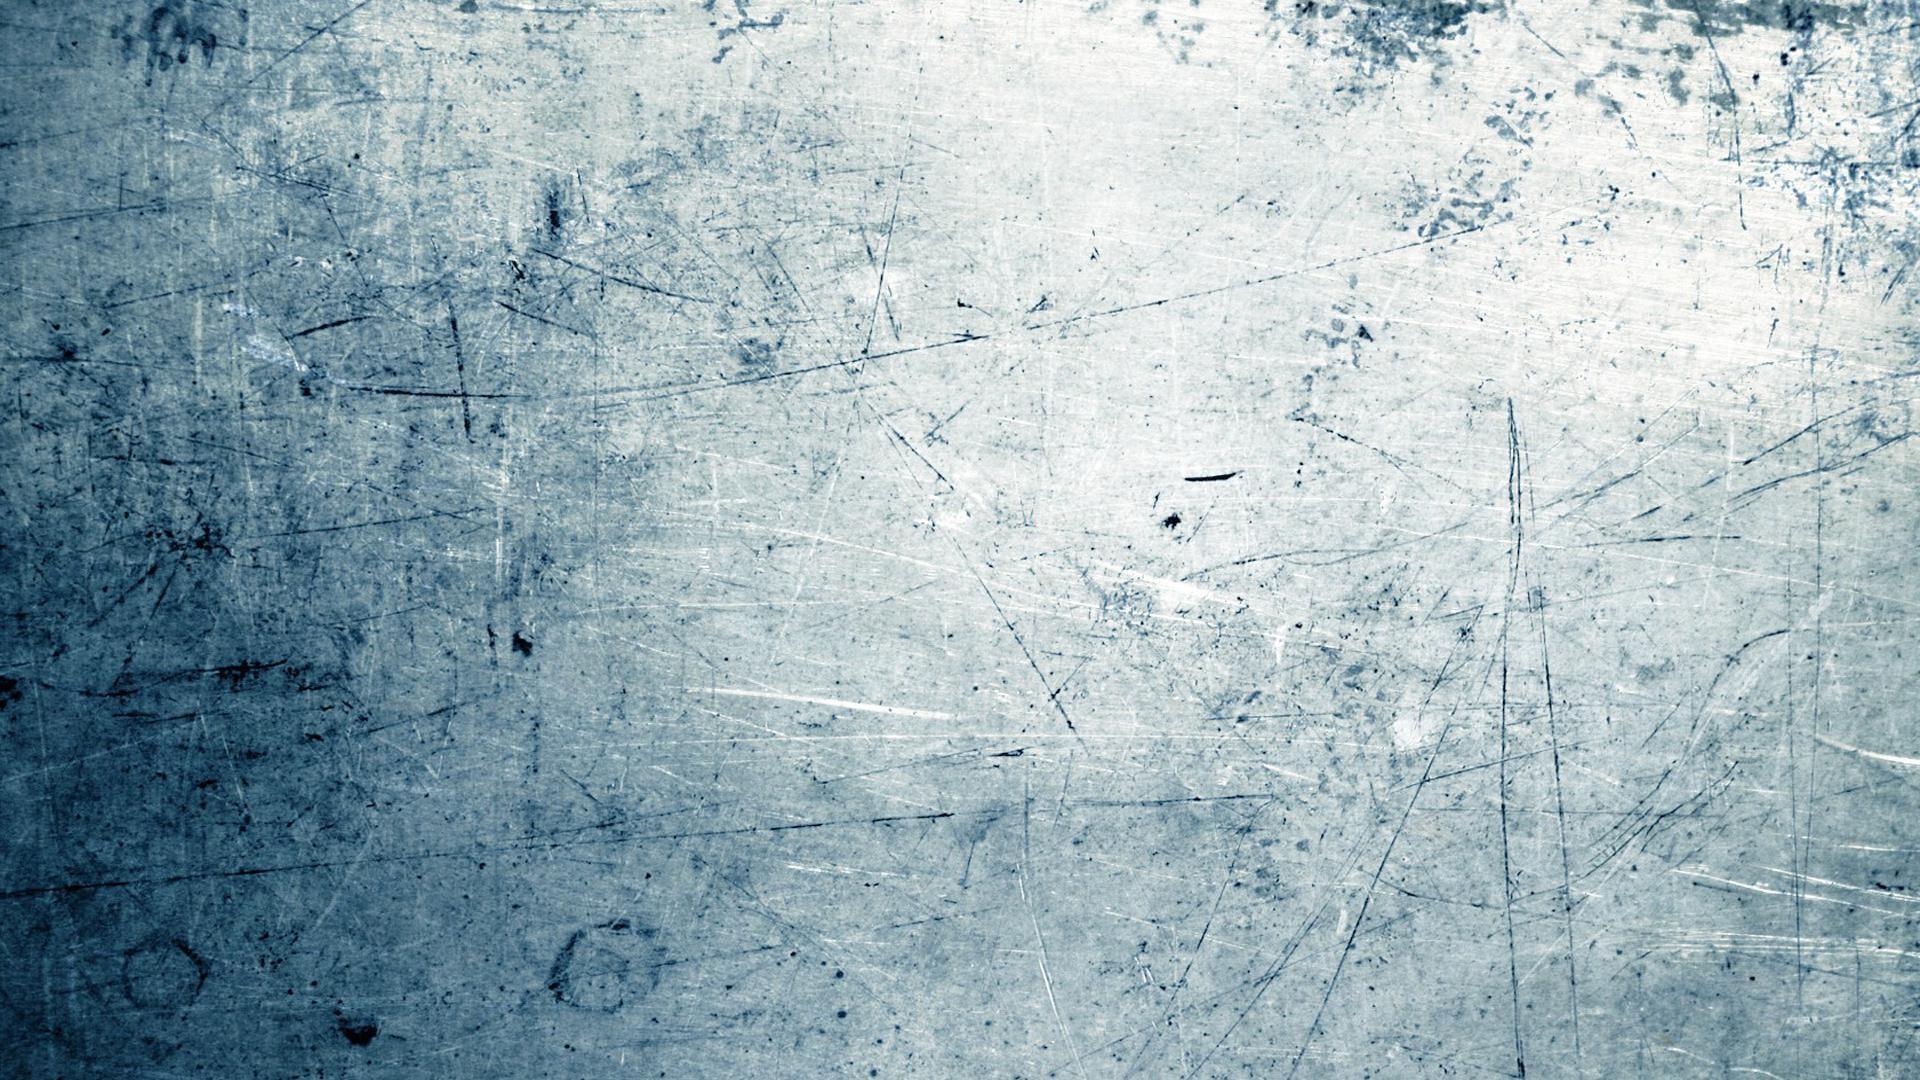 Wallpaper, Texture, Metal, Textured, Media 890492